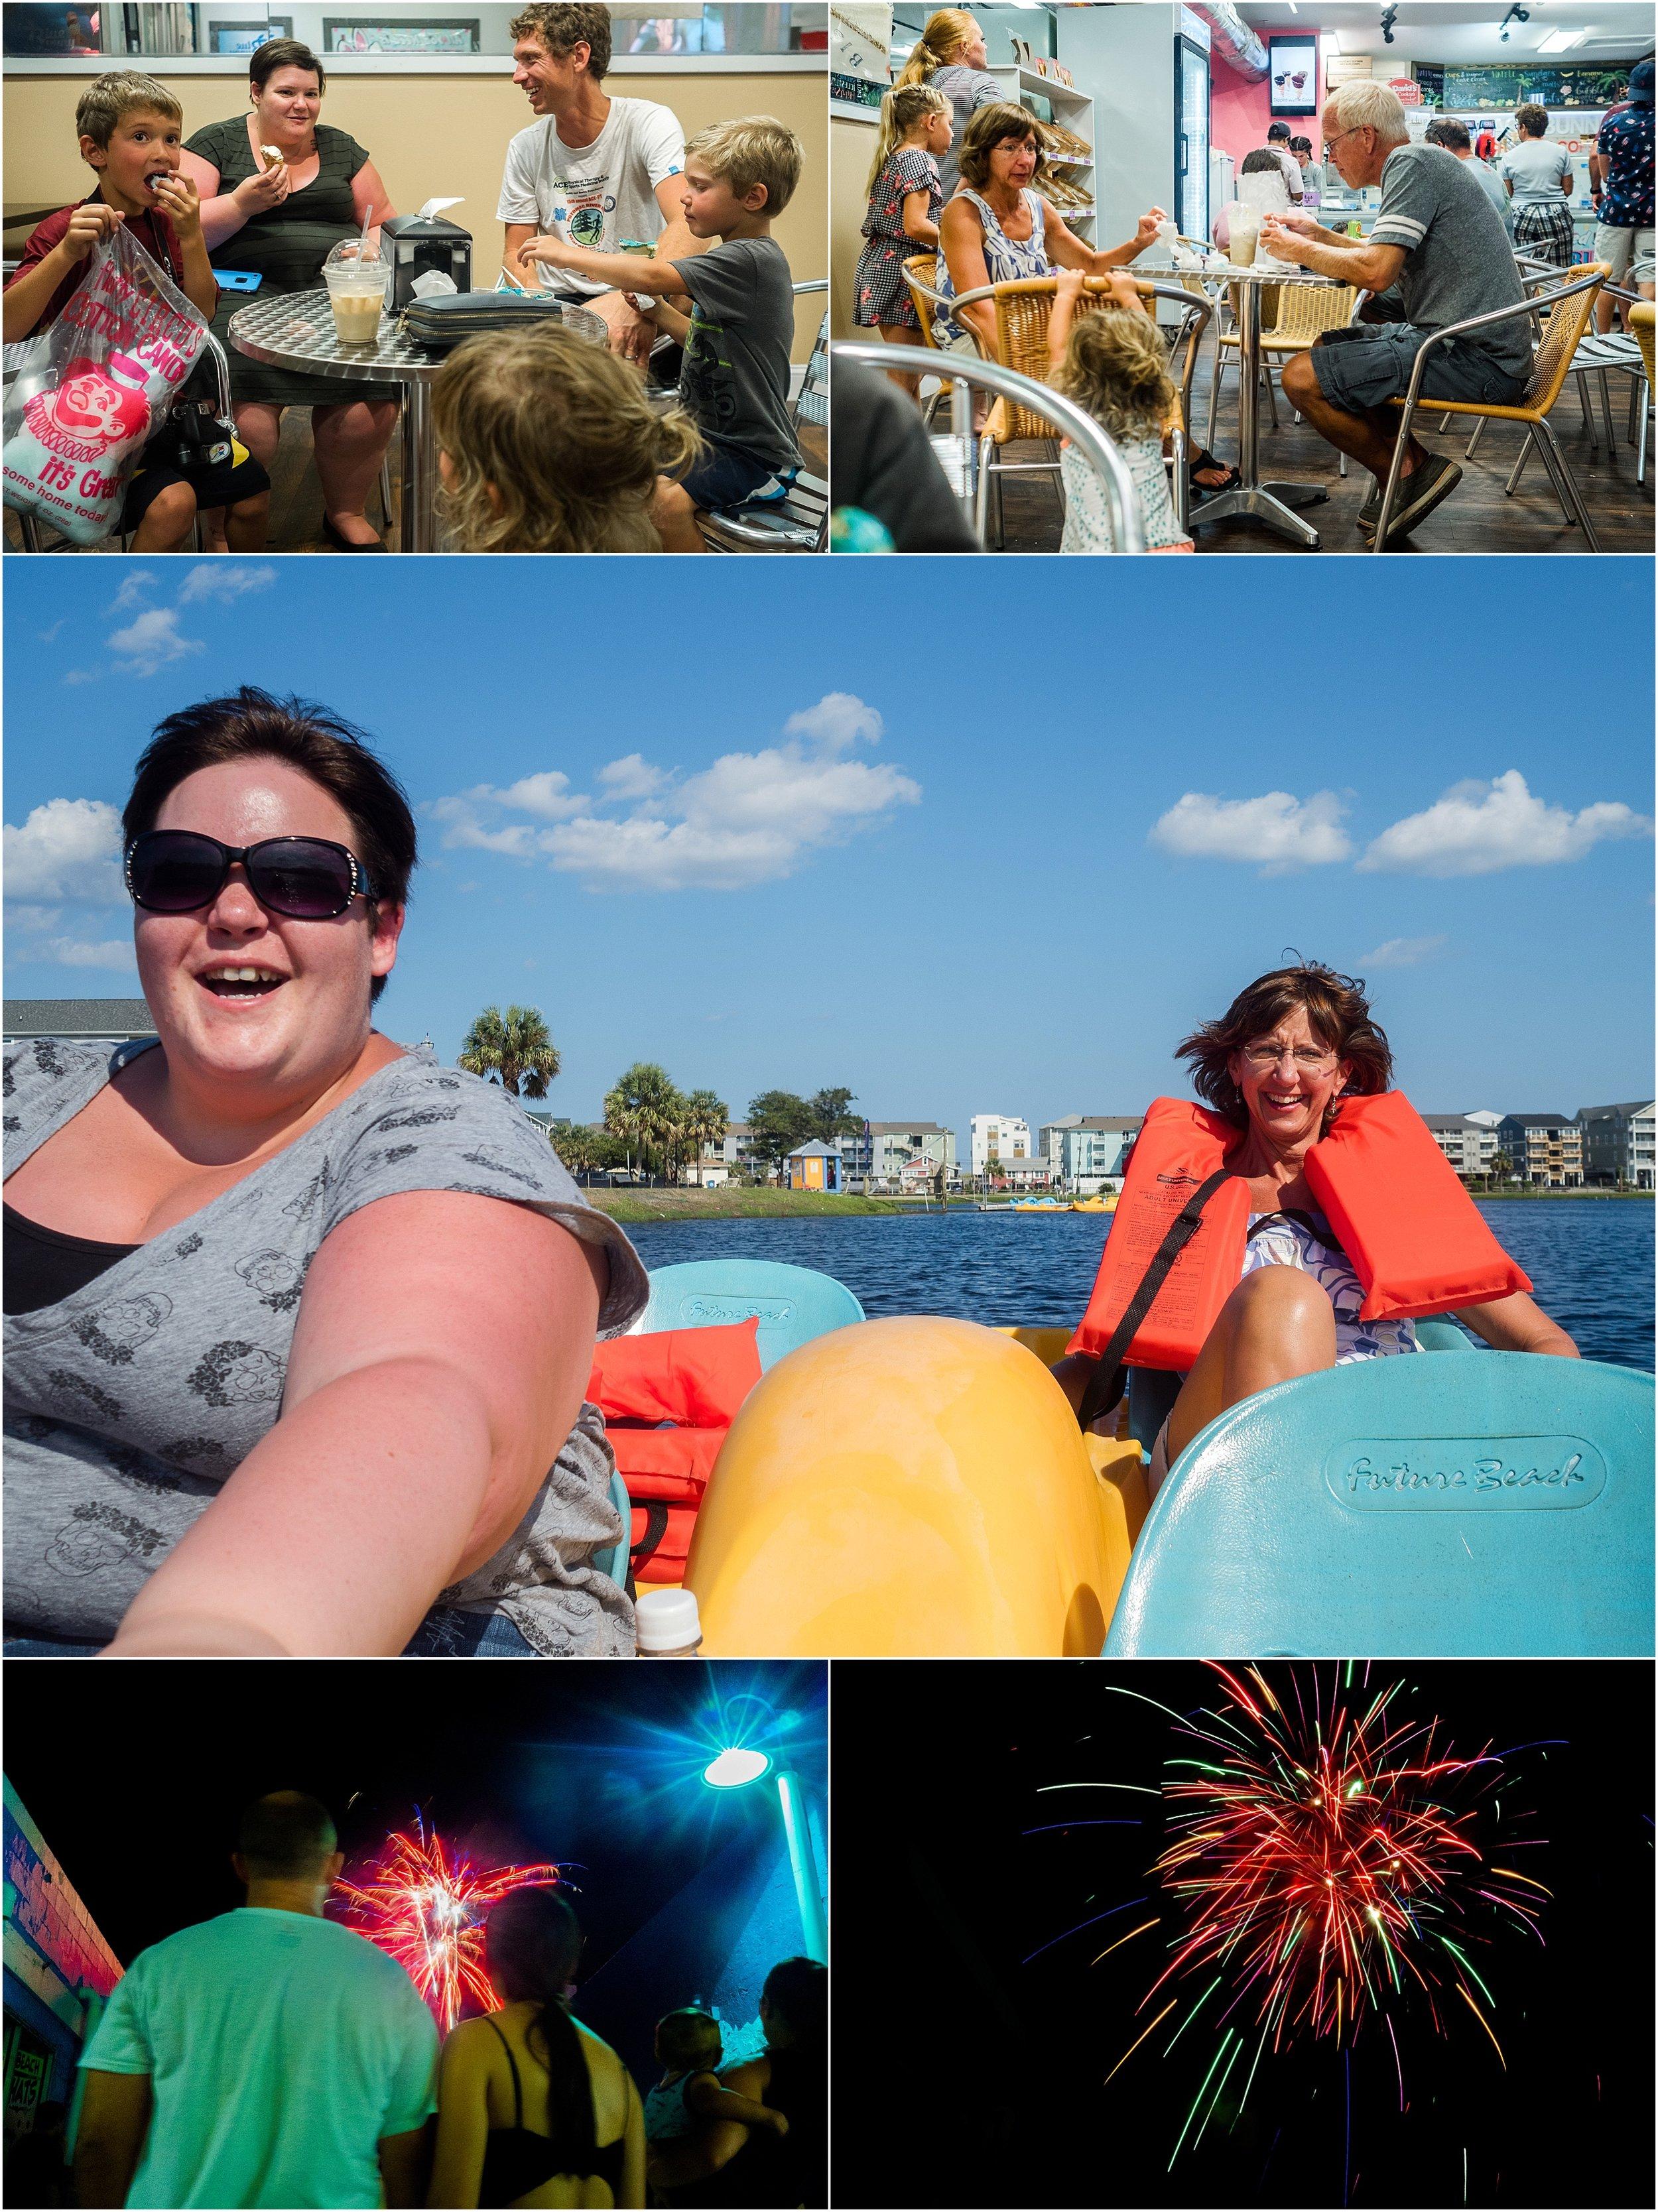 peddle boat Carolina Beach Lake Holli Pool Photography Vacation family documentary